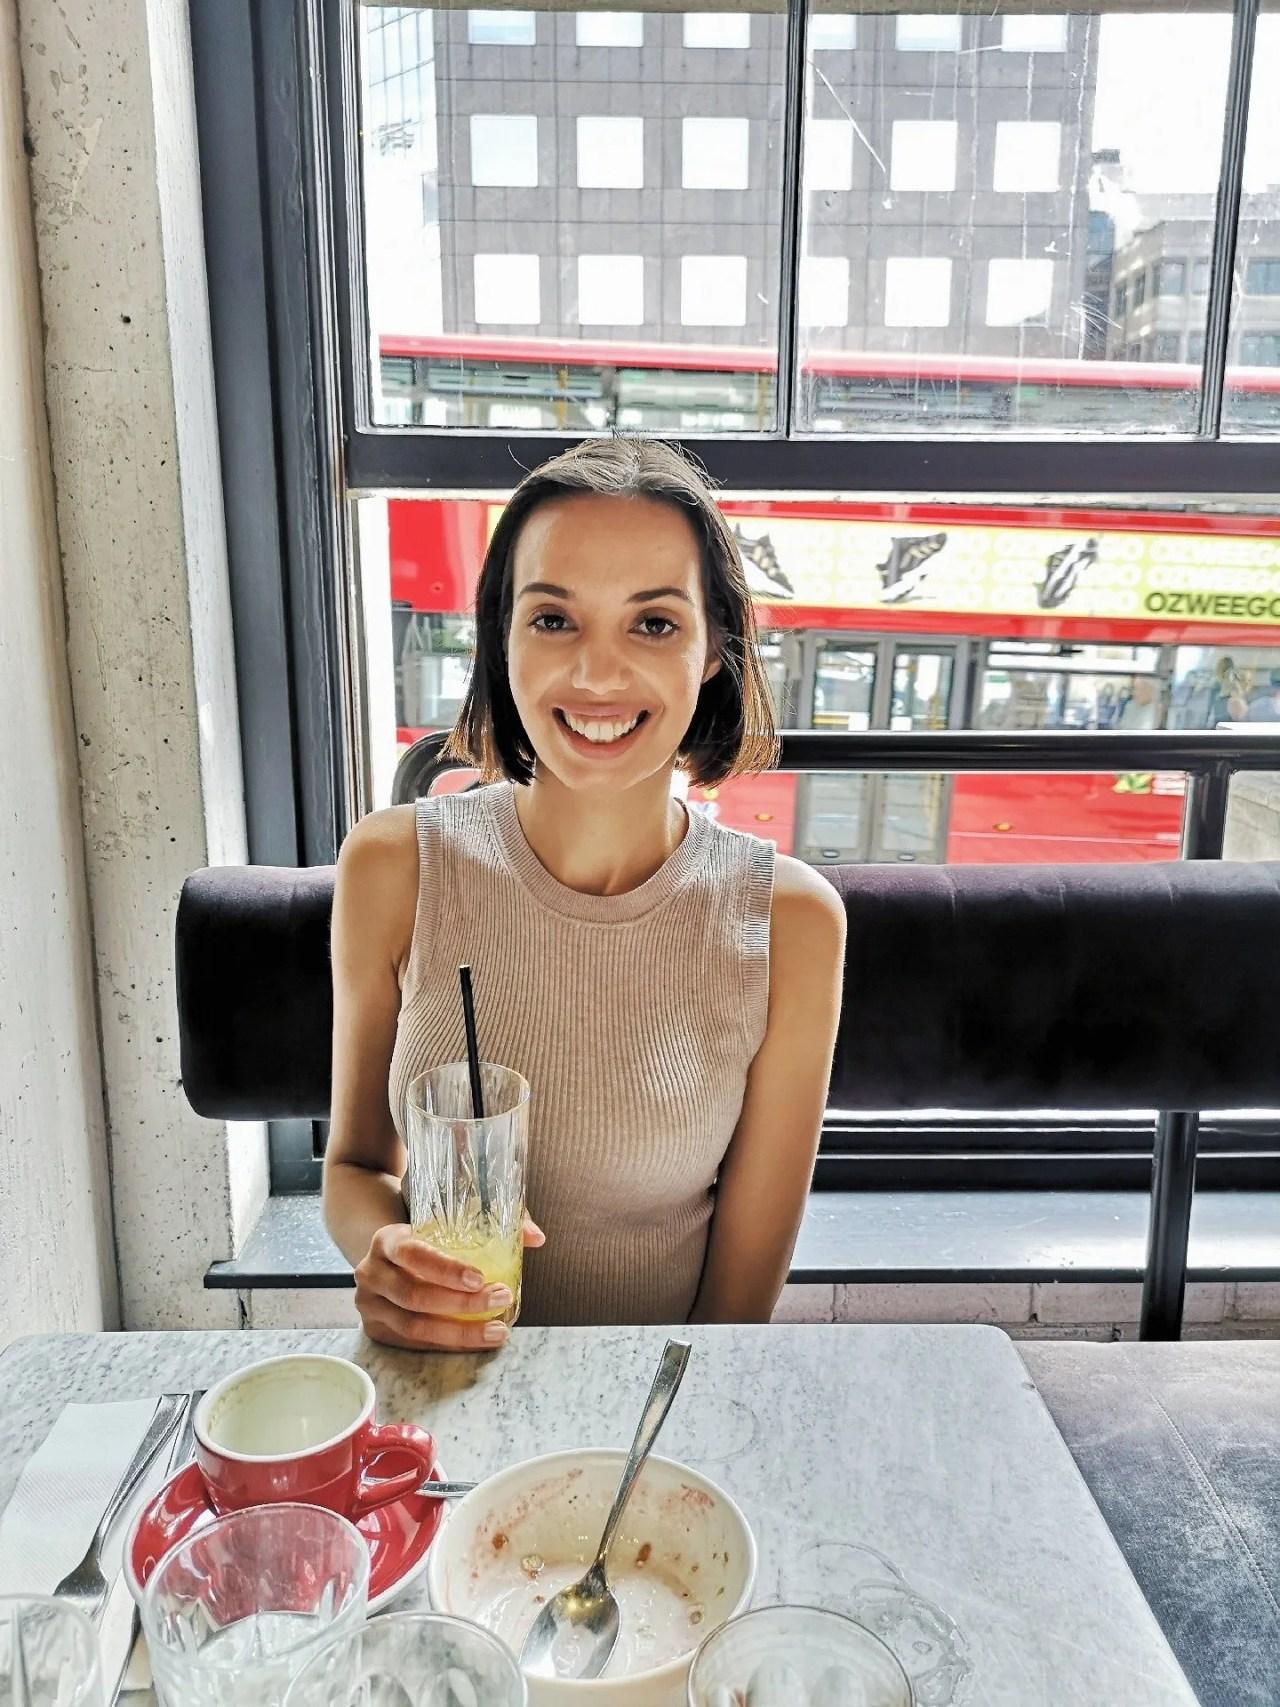 veganism- breakfast smoothie bowl, black Americano - The Style of Laura Jane - women's lifestyle blog UK